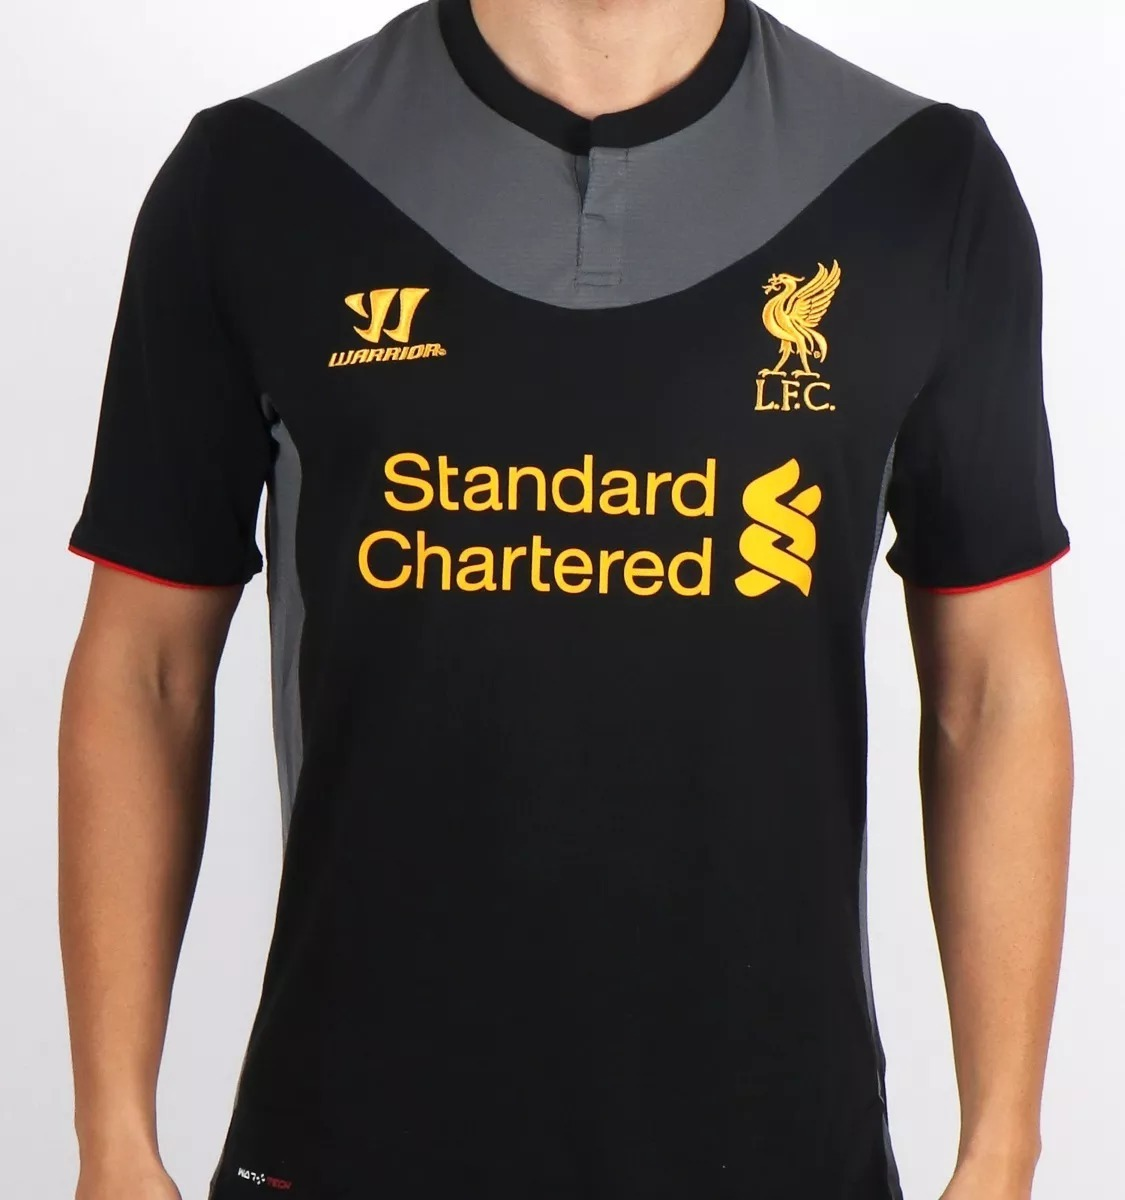 bba94d65f Camisa Liverpool Football Club 2013 Warrior - Inglaterra - R  120